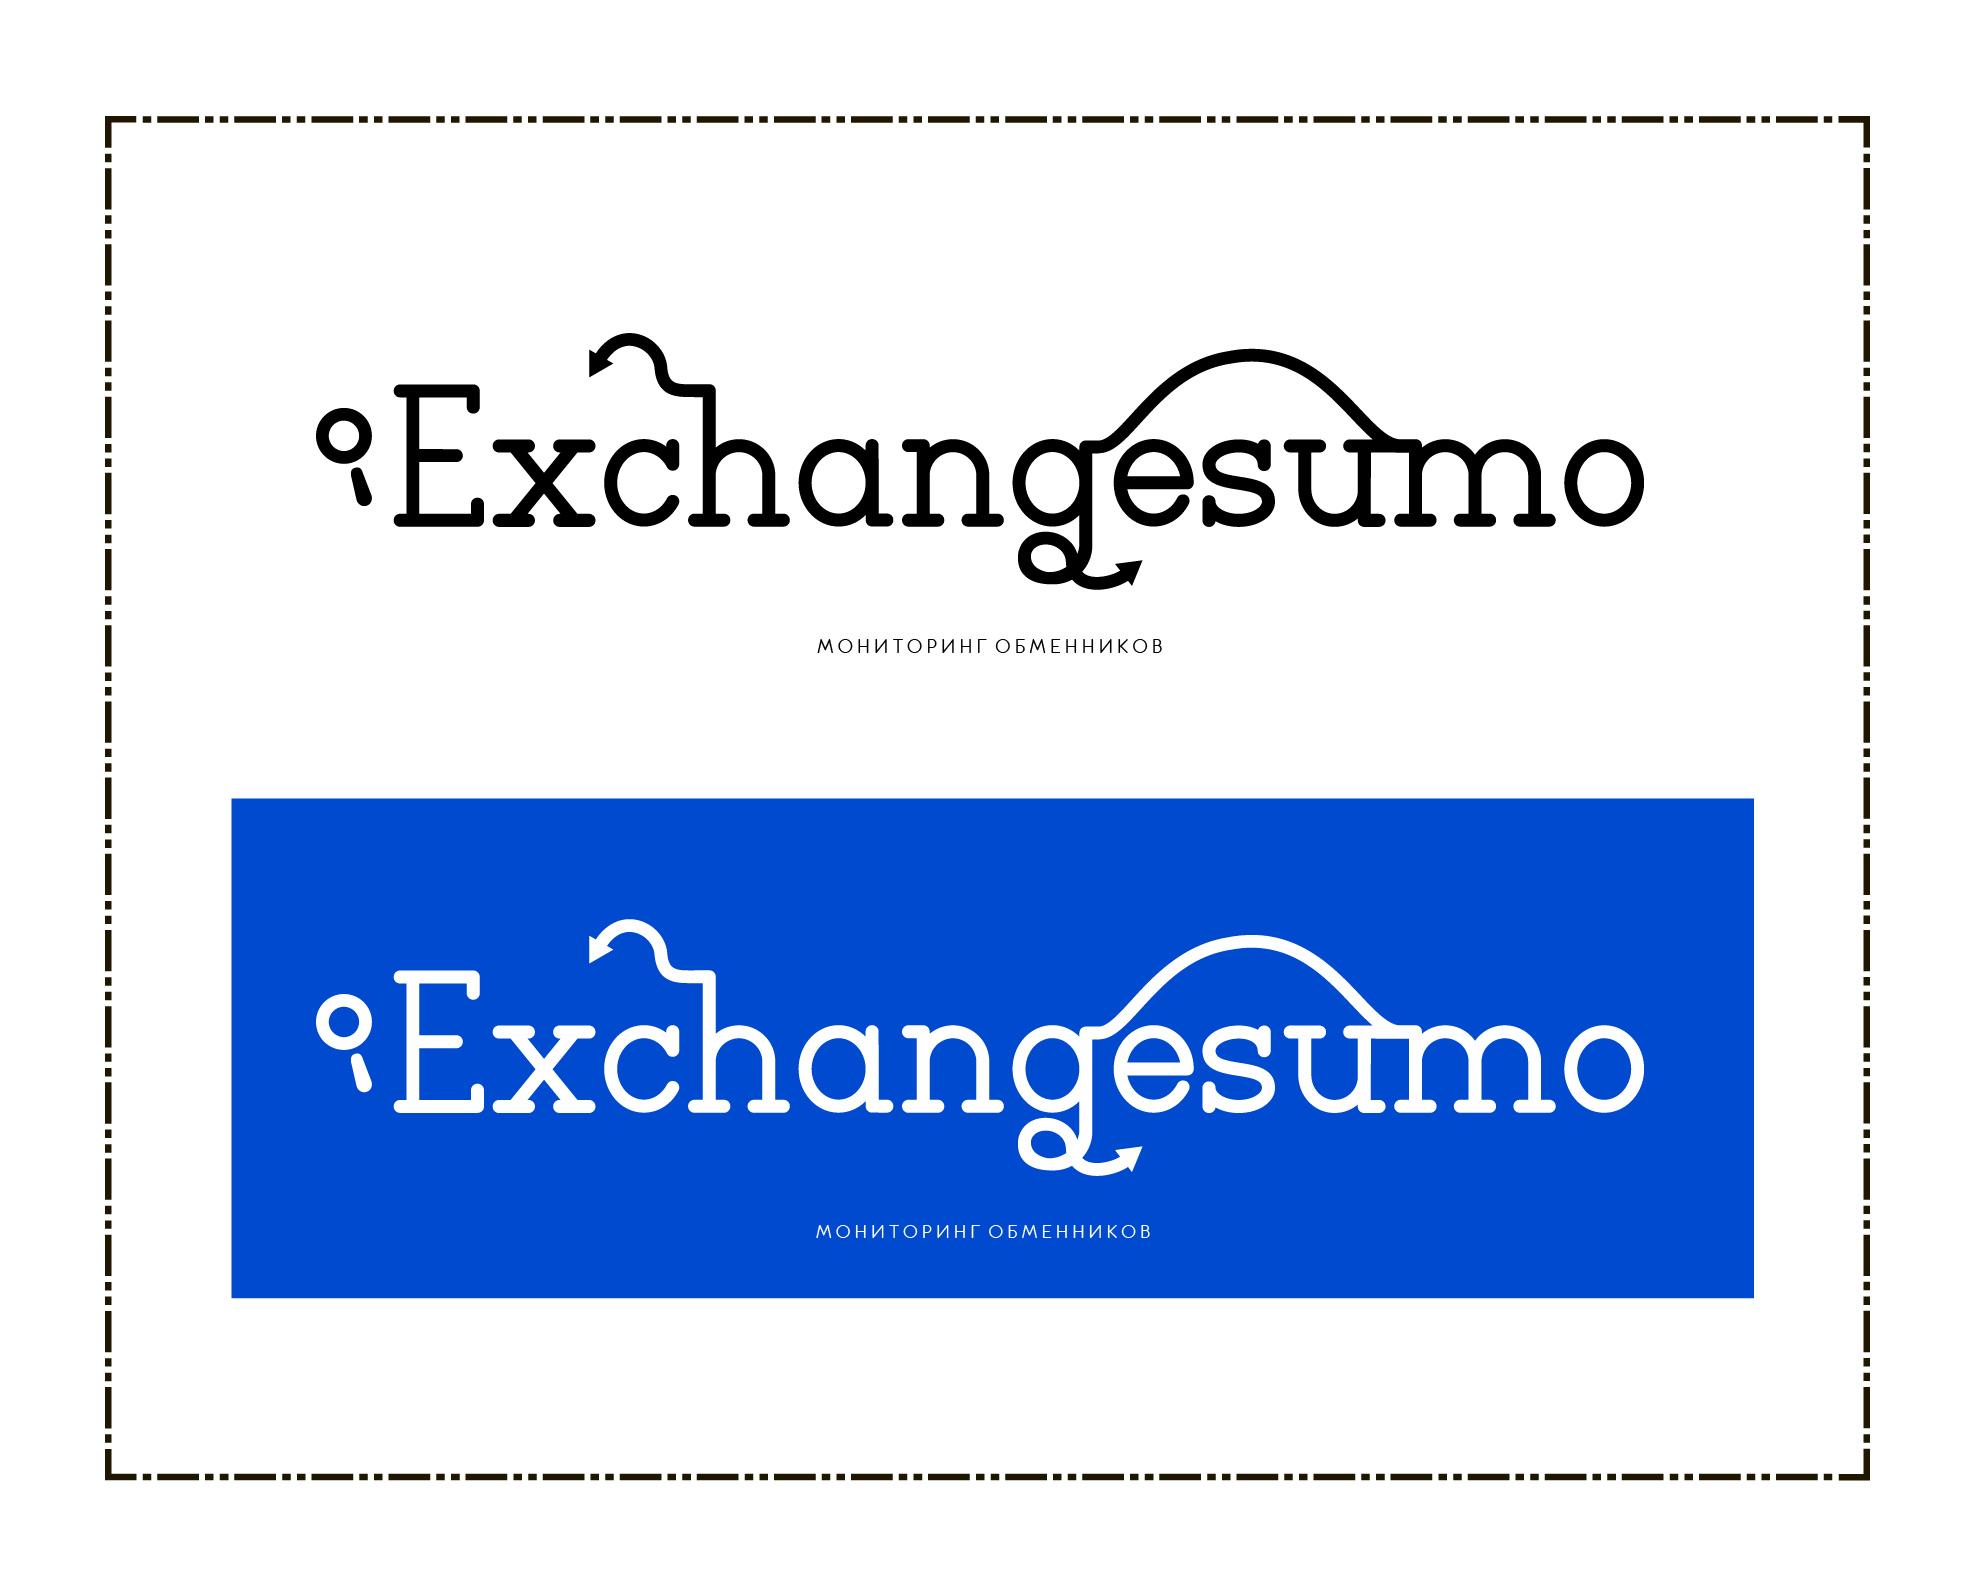 Логотип для мониторинга обменников фото f_1825bb0ebae9c388.jpg